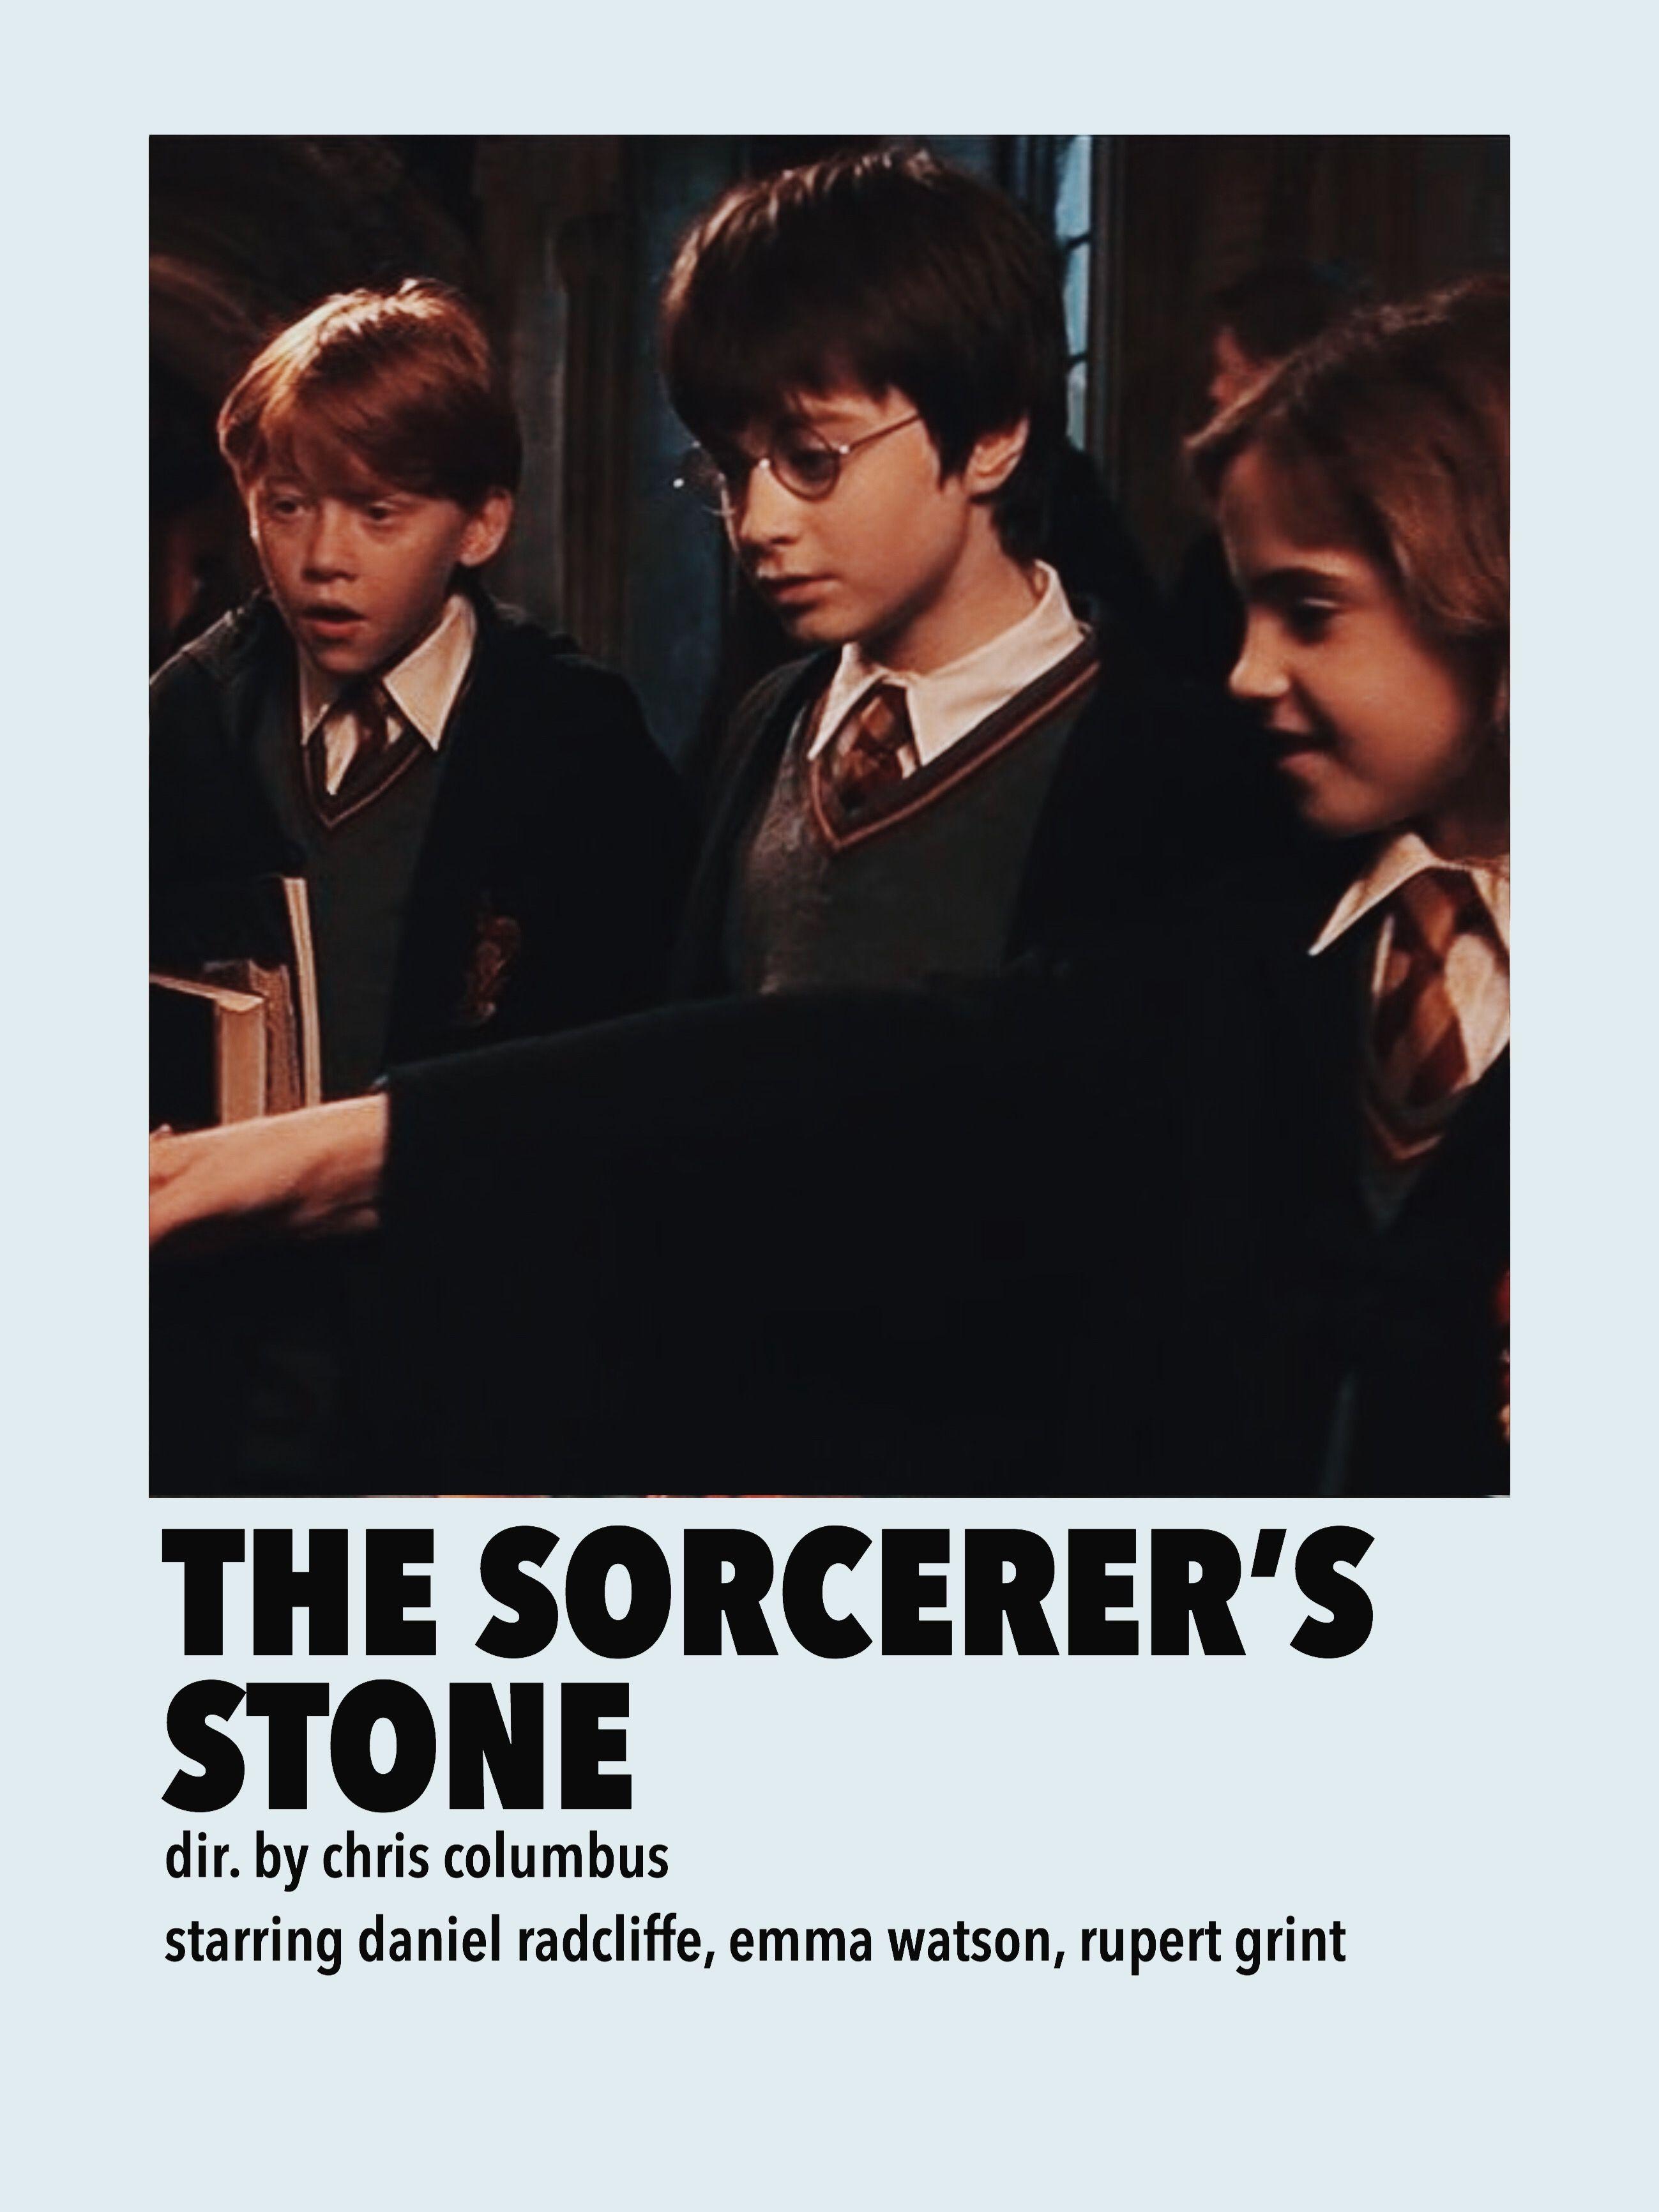 Harry Potter Movie Poster Harry Potter Movie Posters Harry Potter Movies Movie Posters